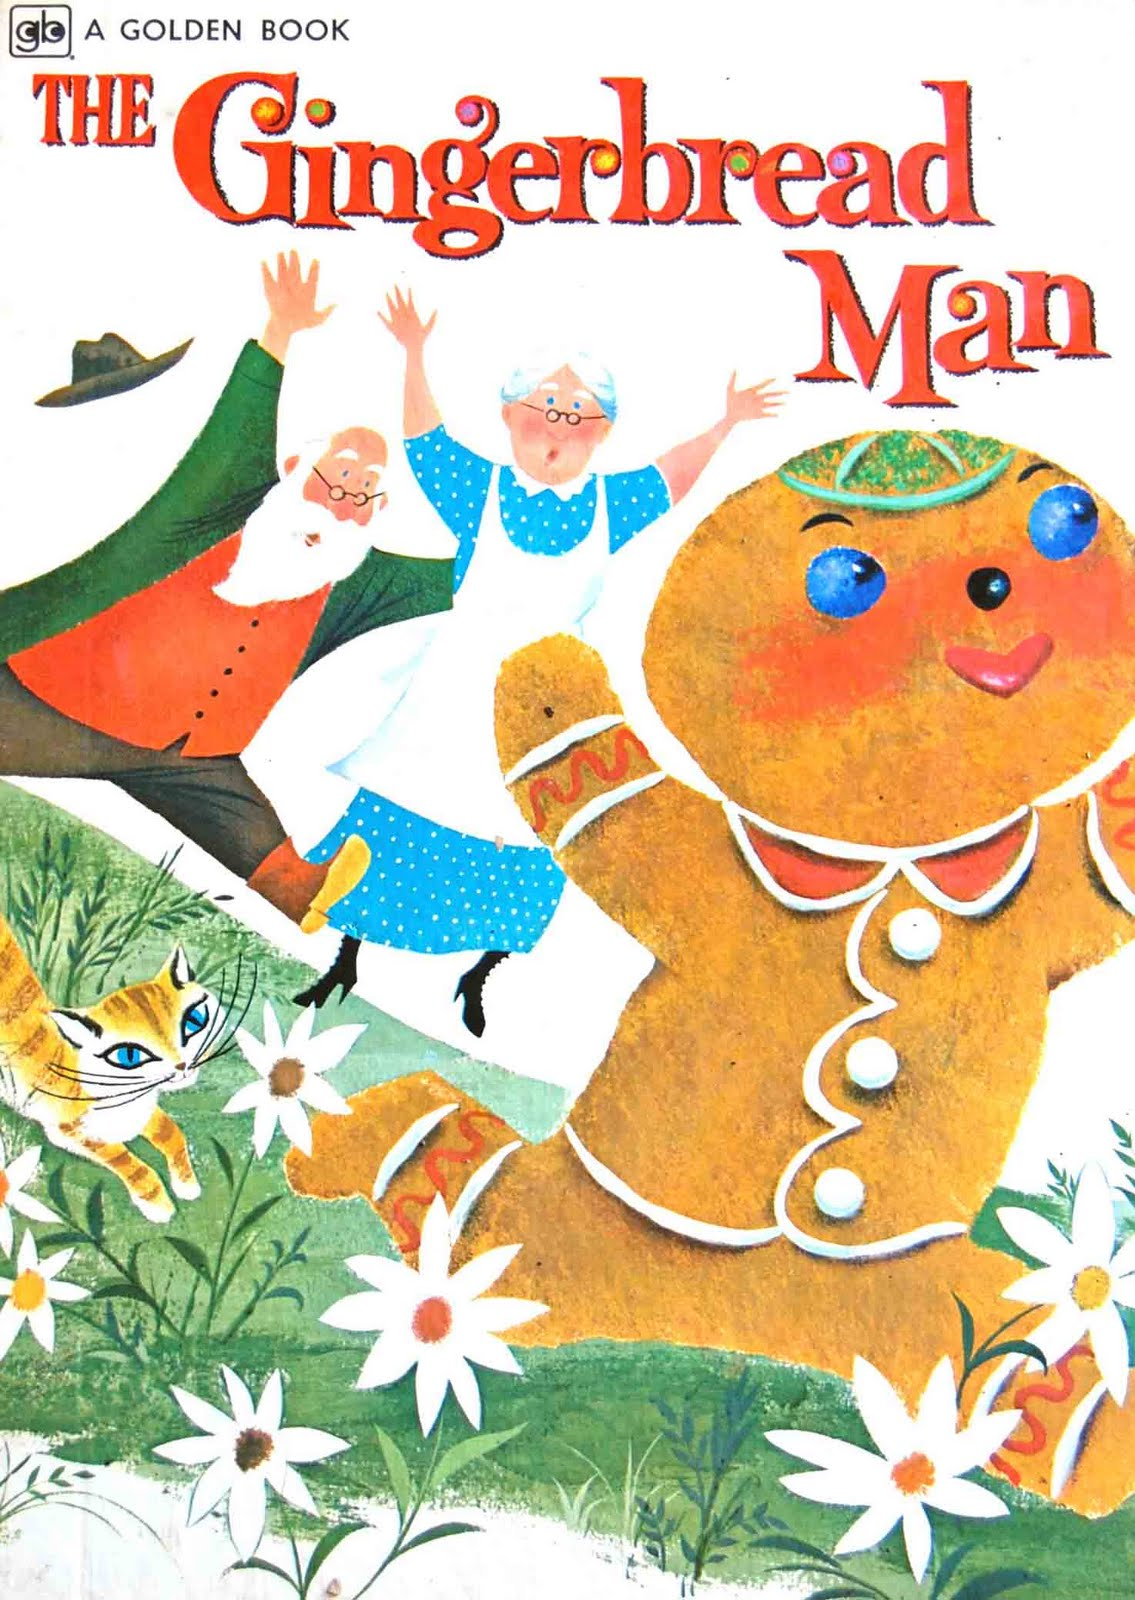 Vintage Kids' Books My Kid Loves: The Gingerbread Man